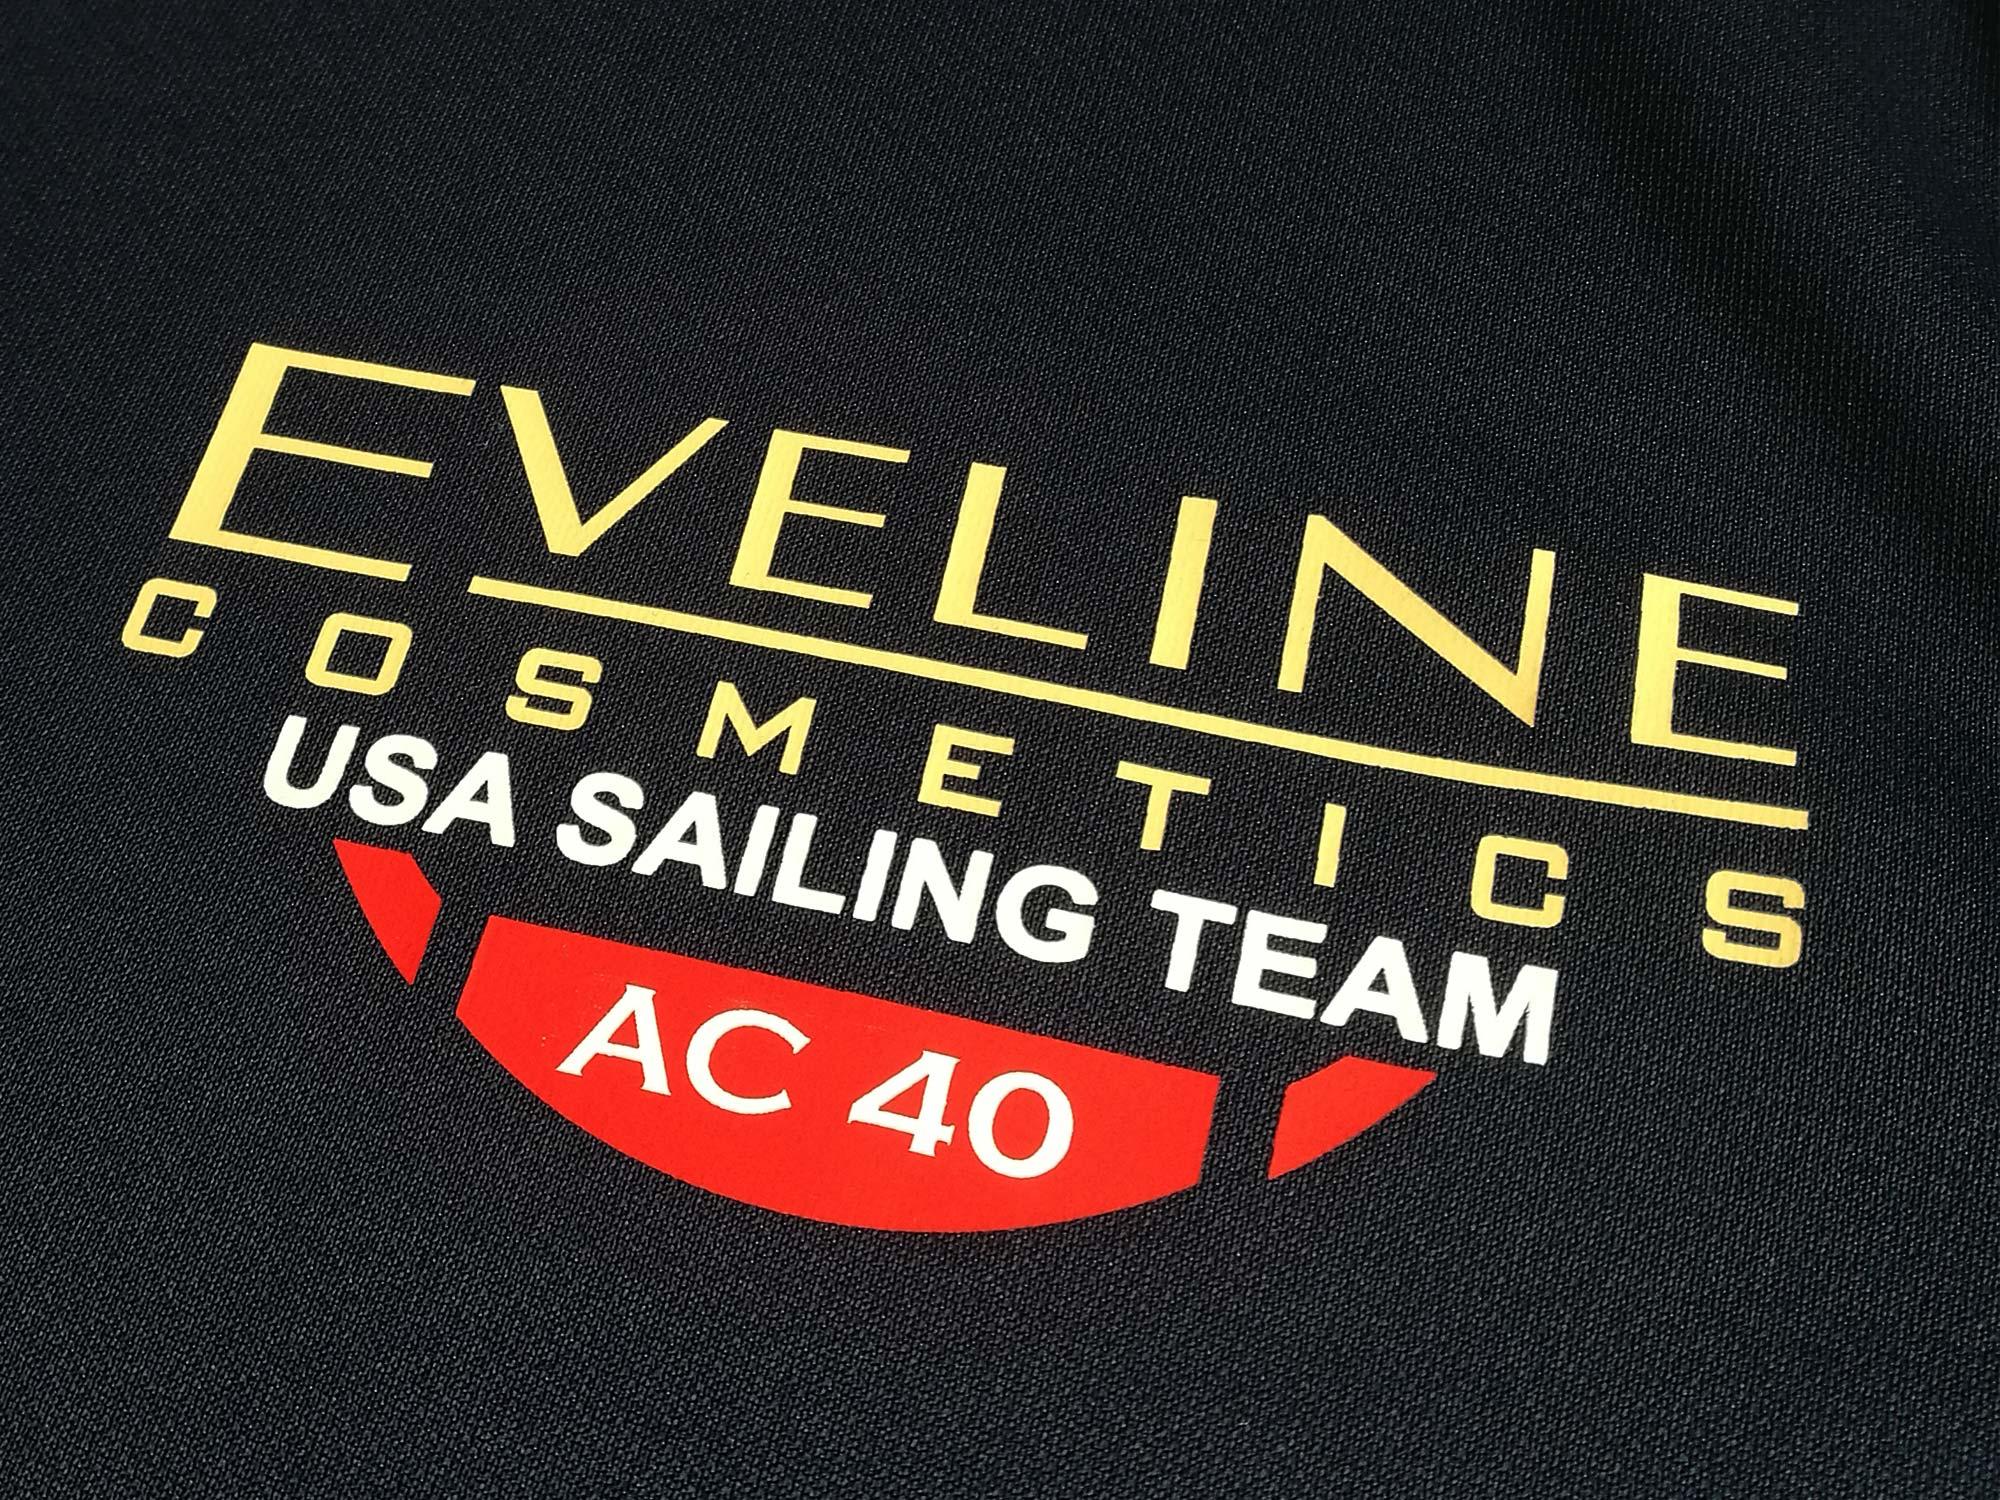 eveline cosmetics usa sailing team